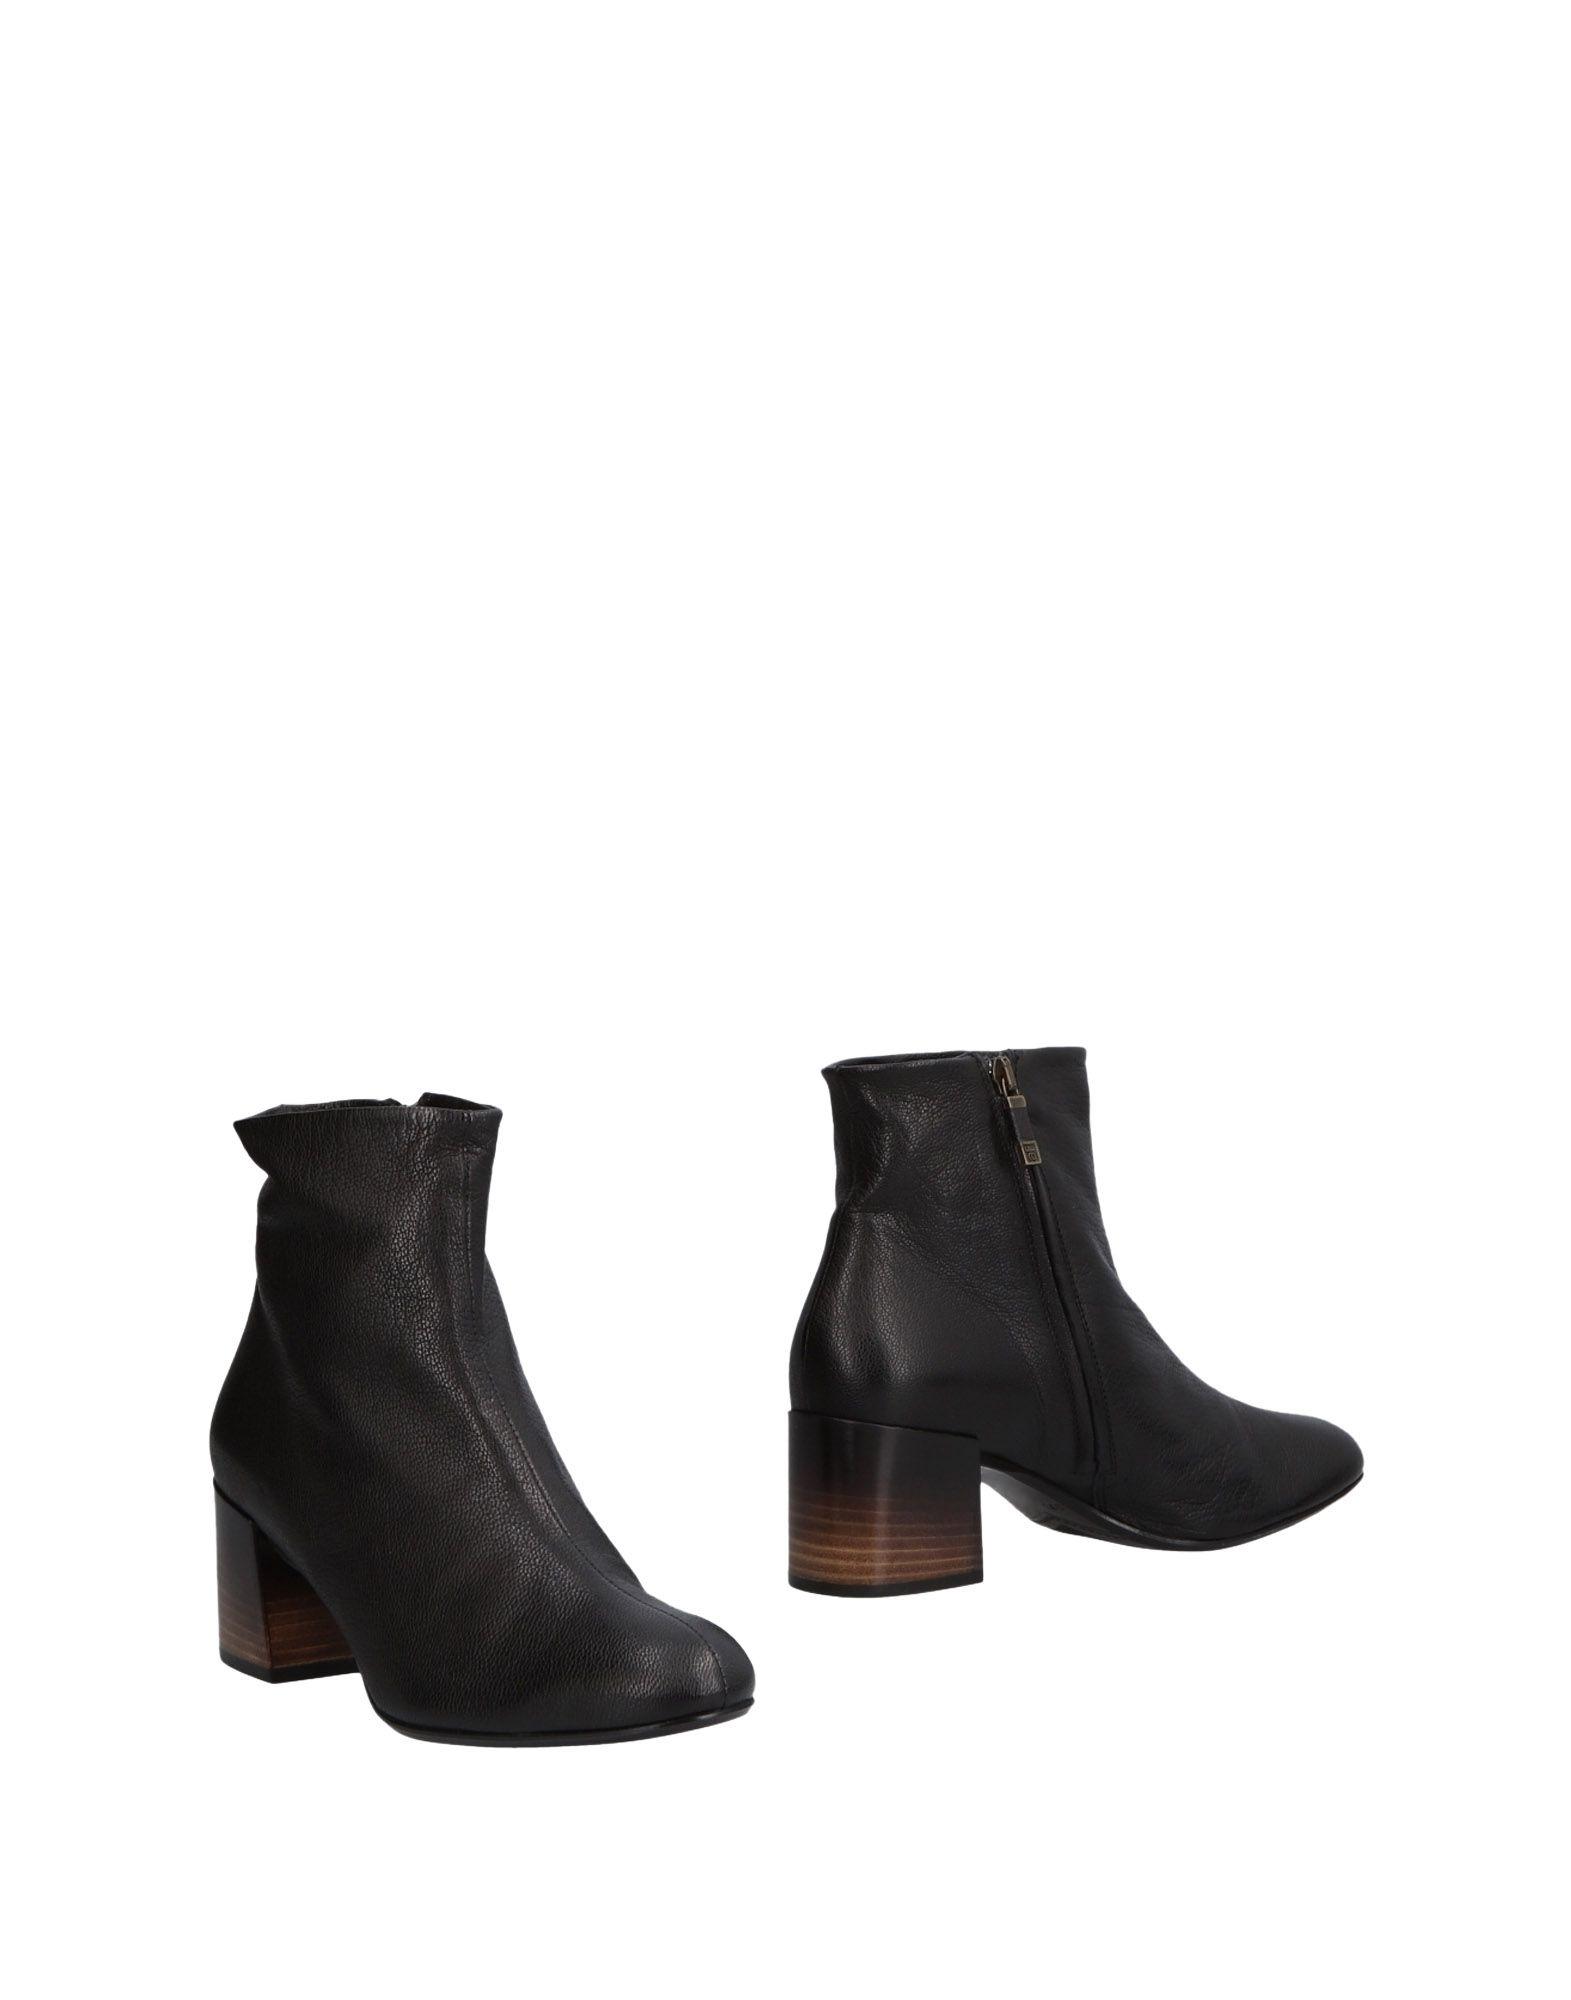 Stilvolle billige Schuhe Alberto Fermani Stiefelette Stiefelette Stiefelette Damen  11482705CD d5c472